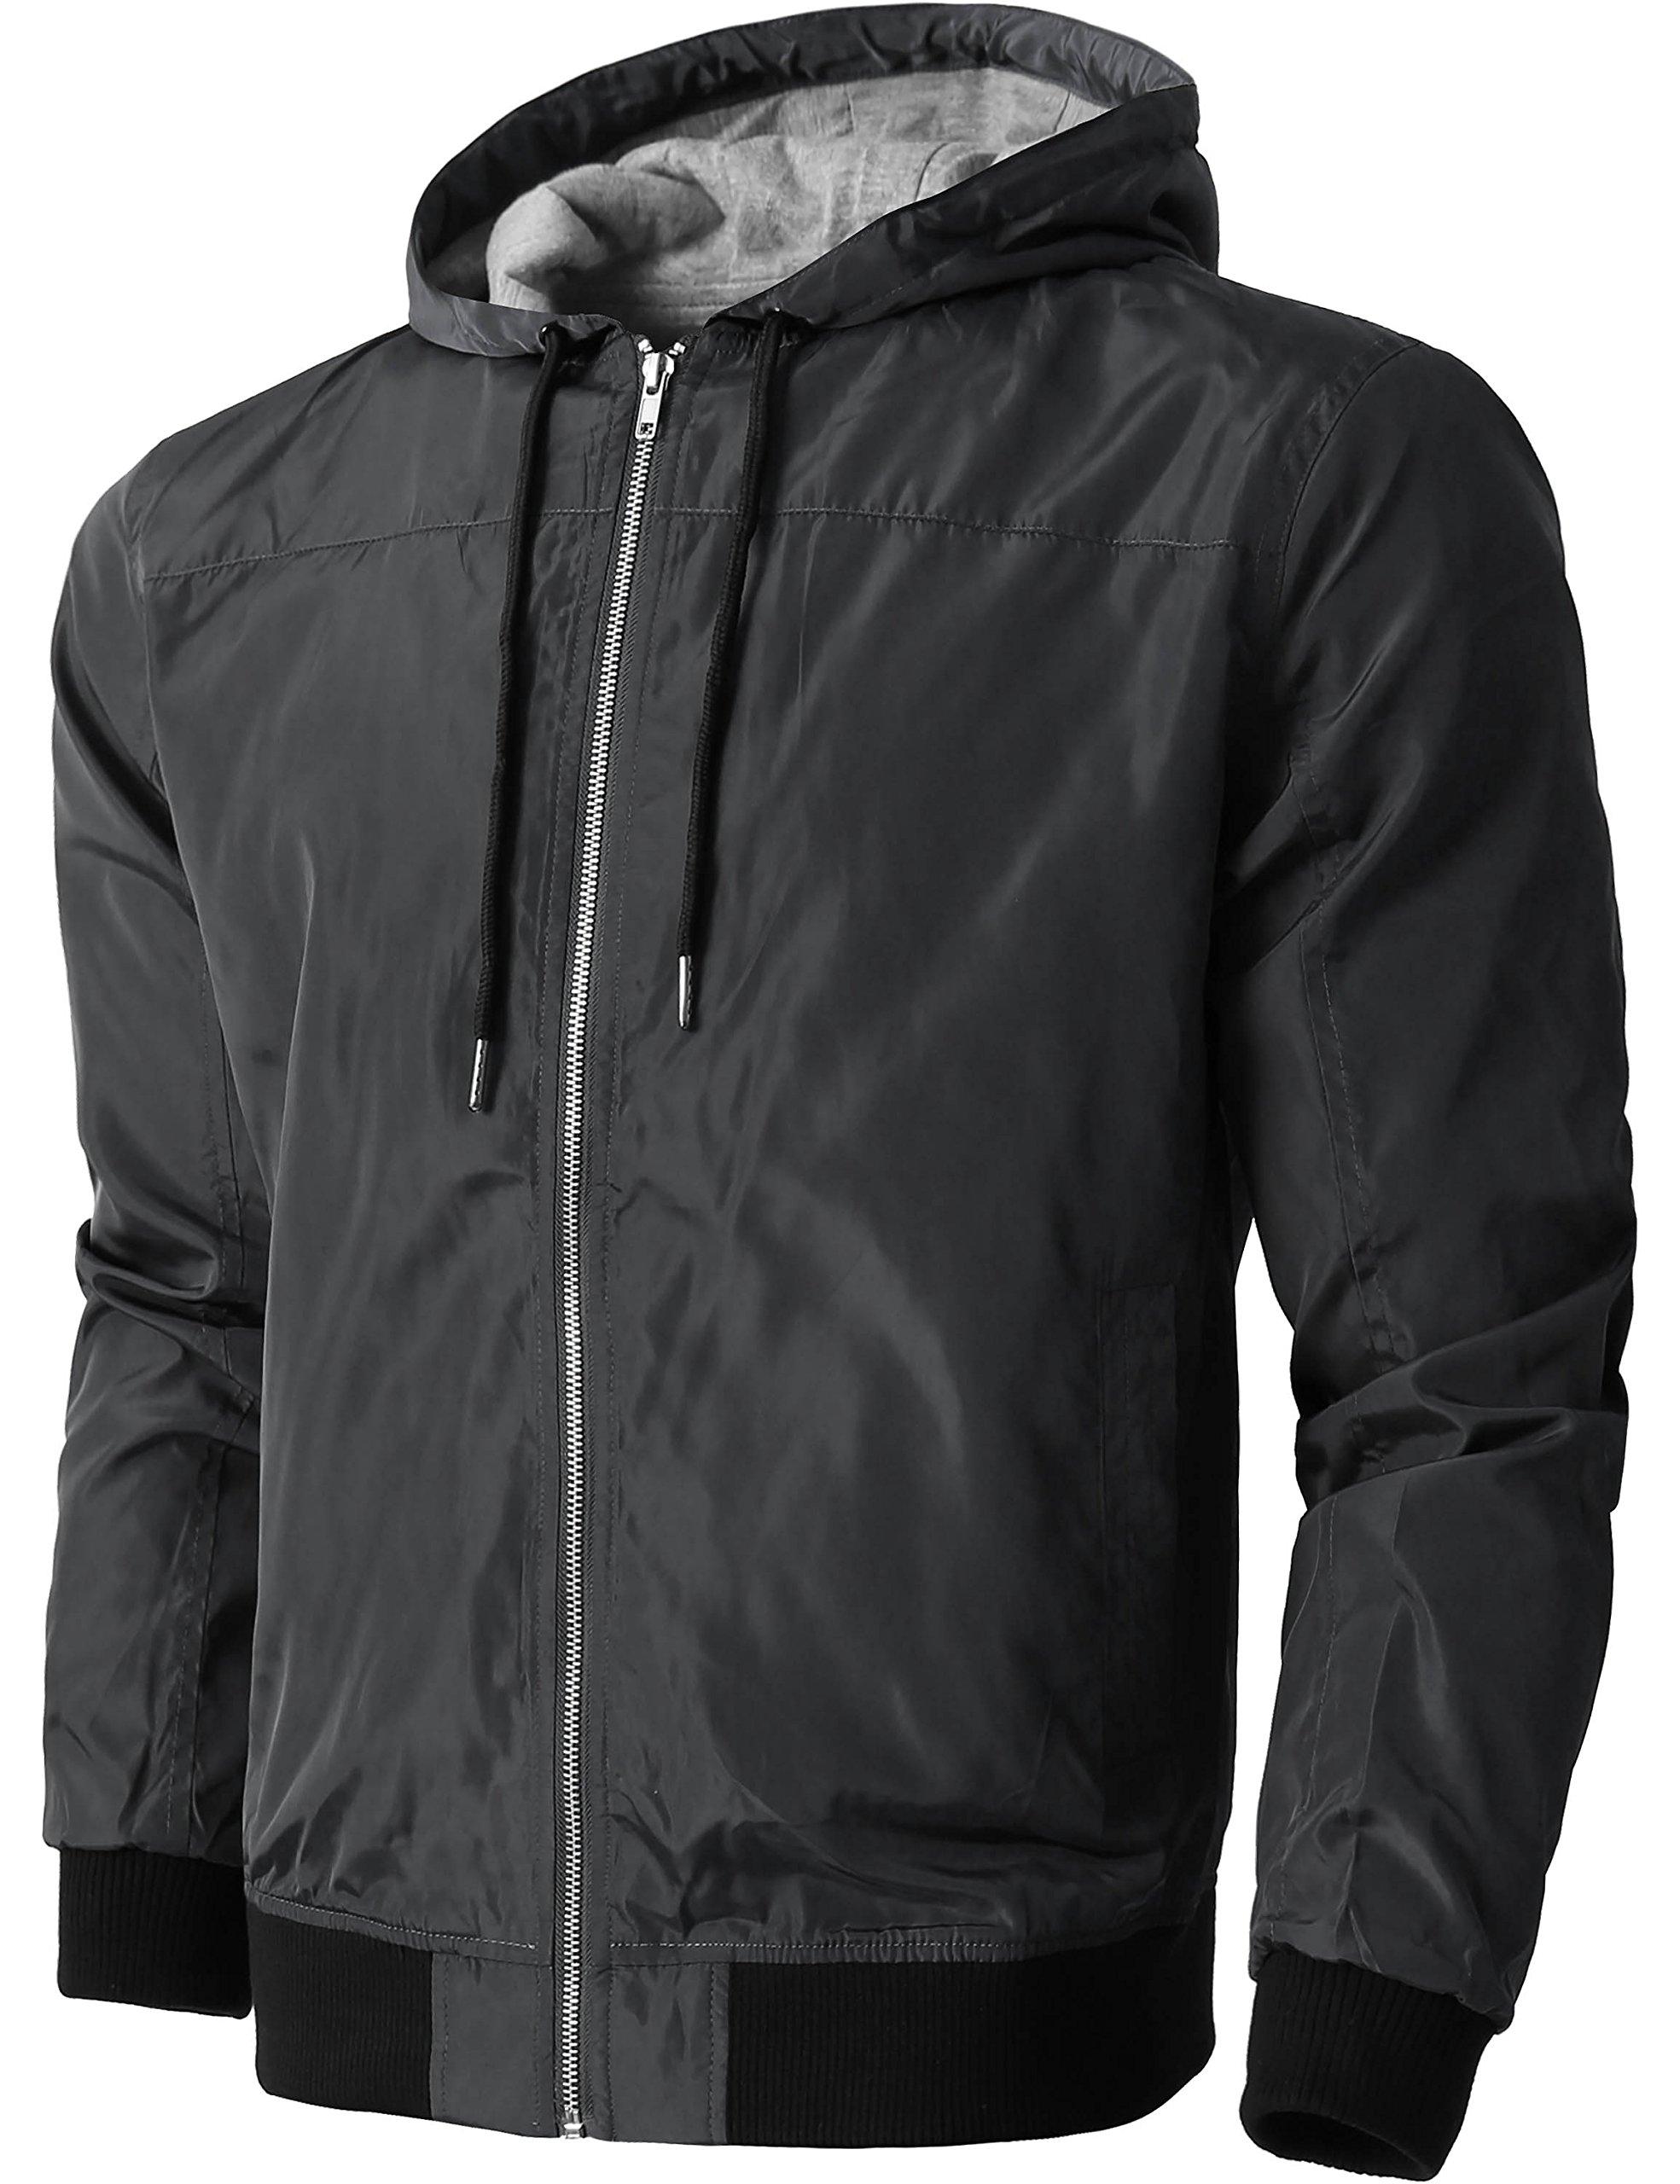 Hat and Beyond KS Mens Windbreaker Active Lightweight Jackets Casual Slim Fit Sweatshirts 1KSA0020 (X-Large, 20_Charcoal)